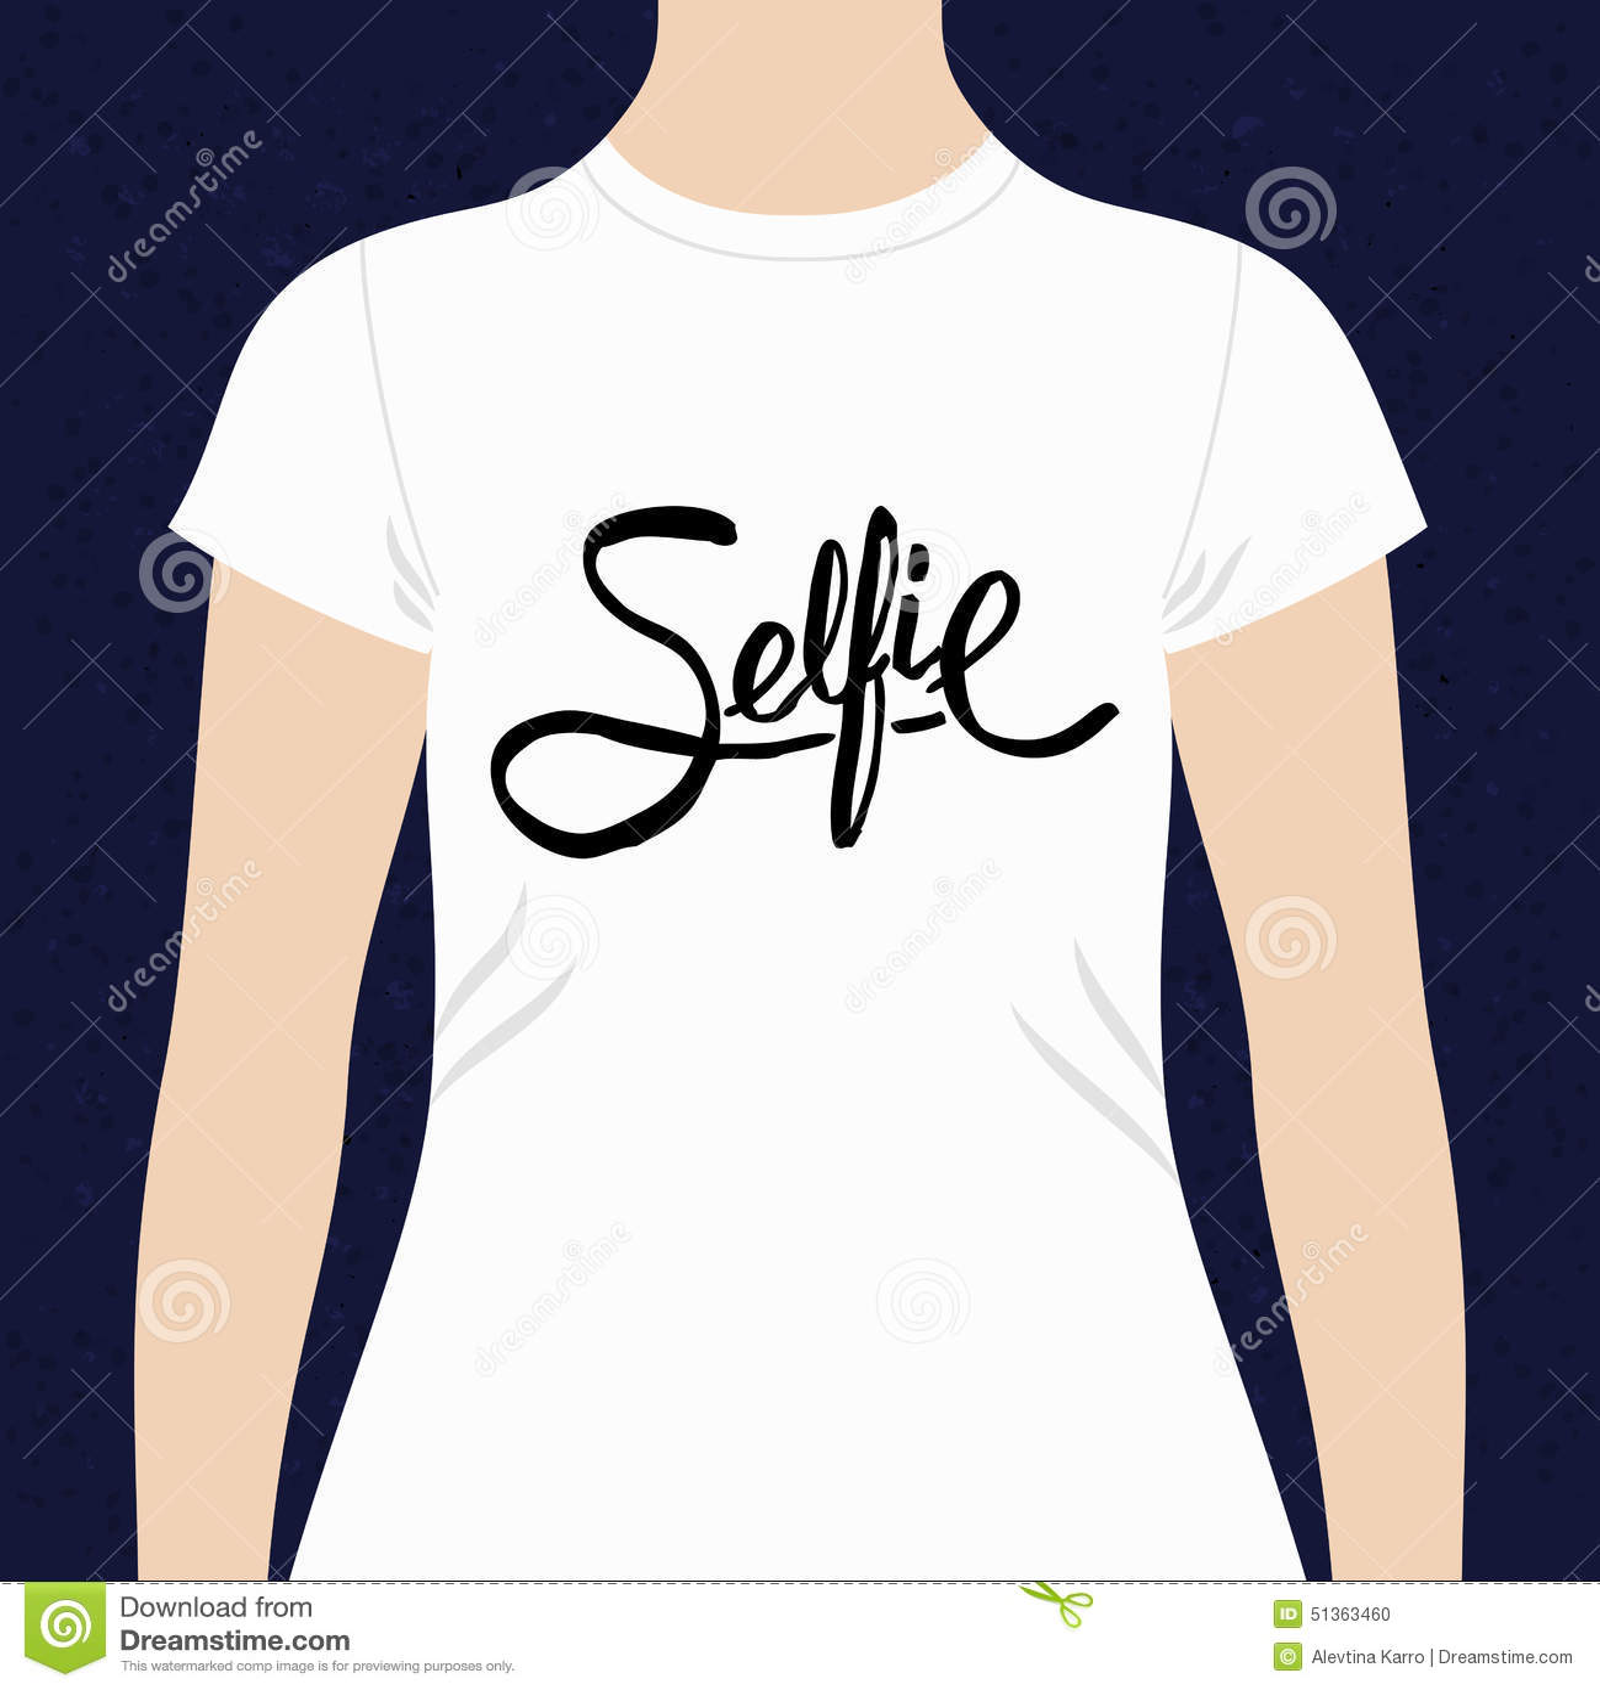 5b9897884e4 Selfie Simple Text Design For A T-shirt Stock Vector - Illustration ...